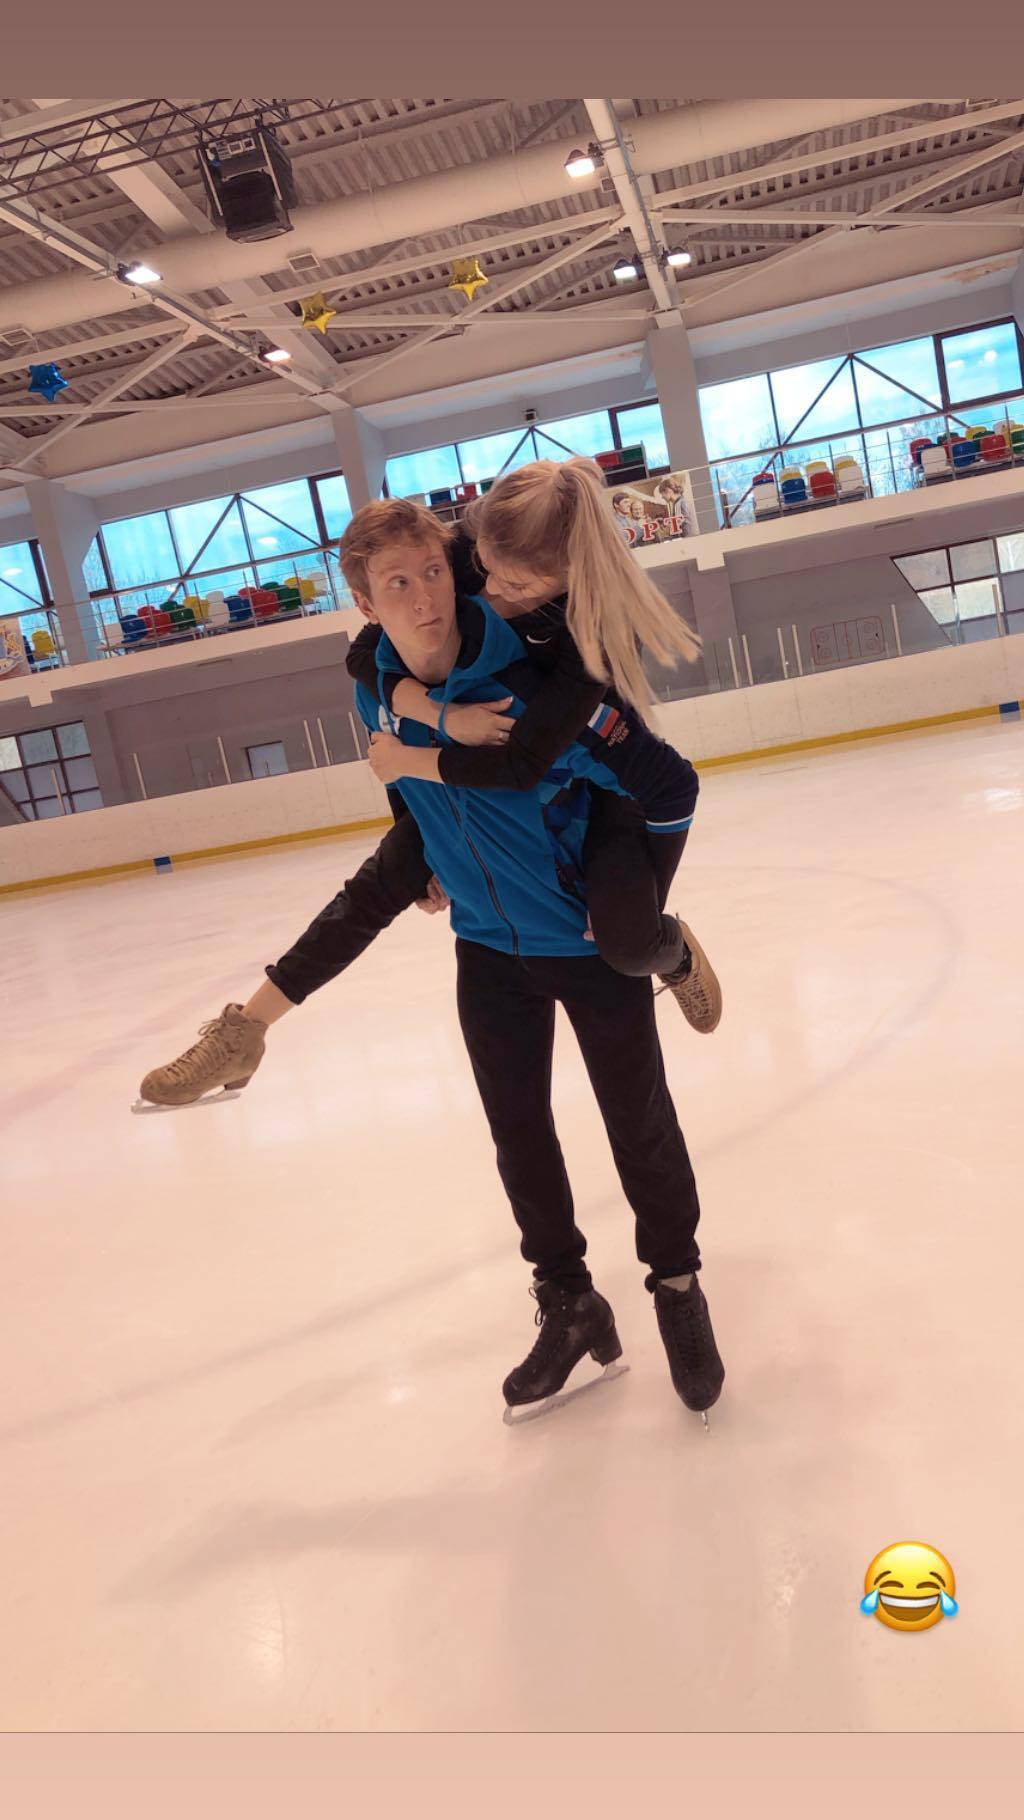 Анастасия Скопцова-Кирилл Алешин/танцы на льду - Страница 11 EiNl4N-RBdw